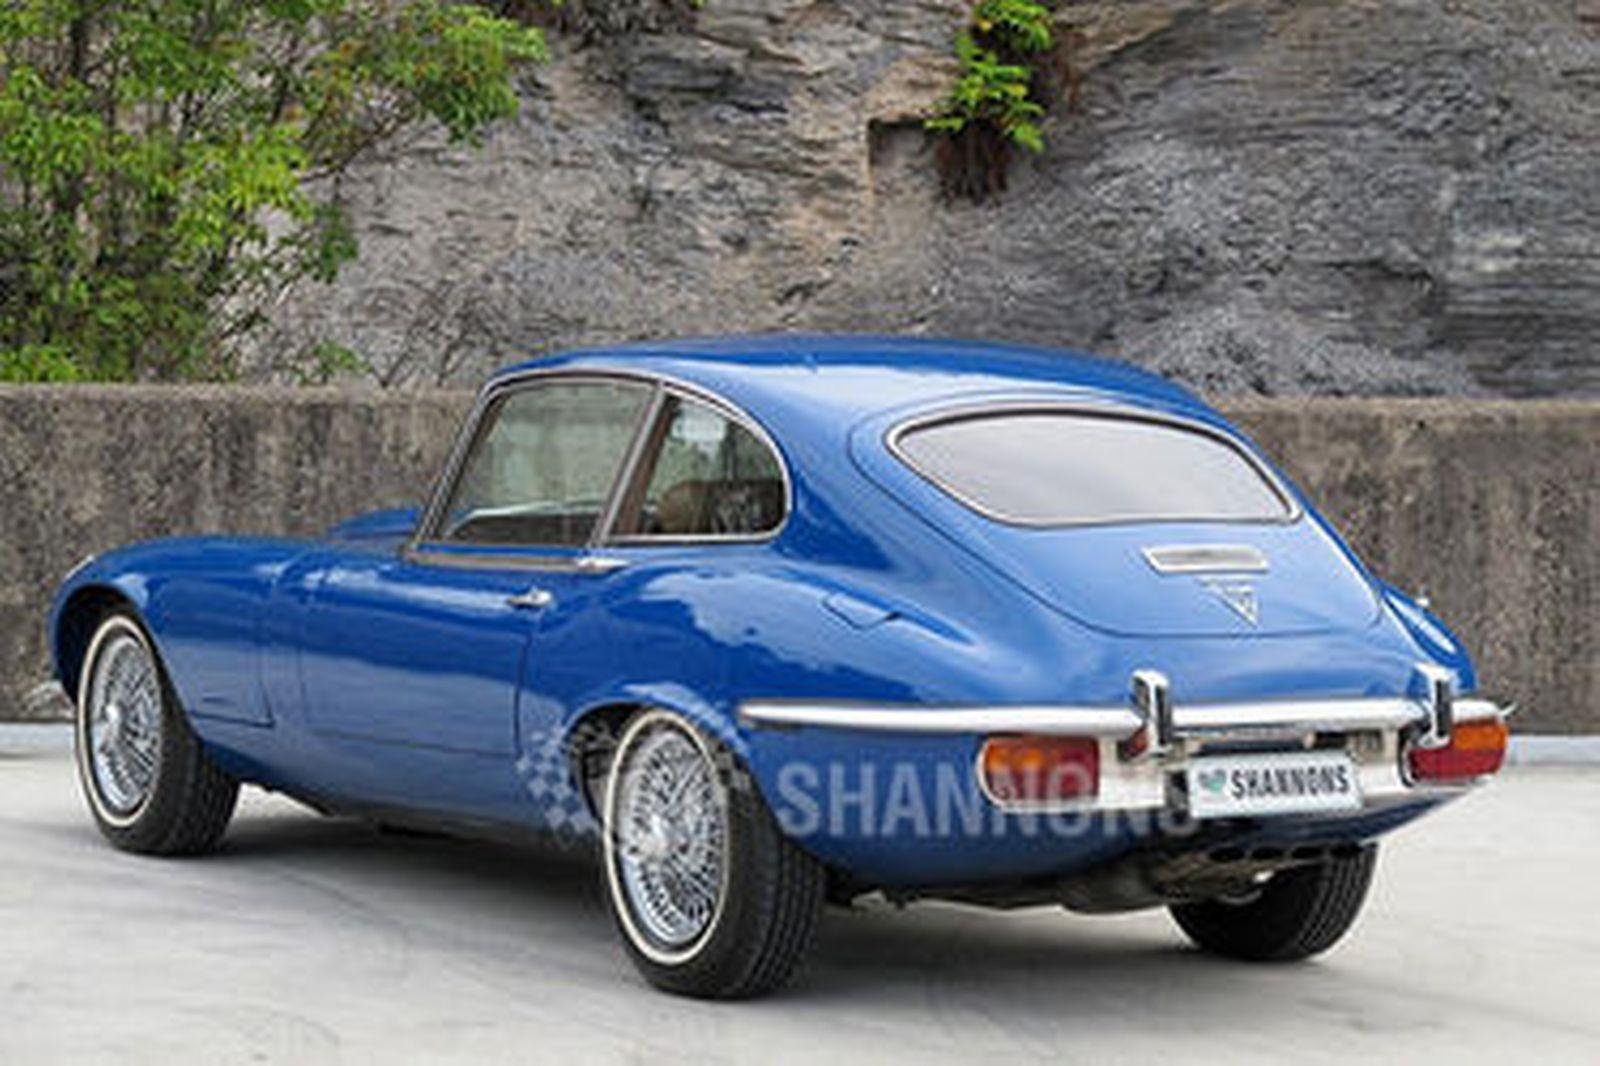 sold jaguar e type series 3 v12 coupe auctions lot 14 shannons. Black Bedroom Furniture Sets. Home Design Ideas